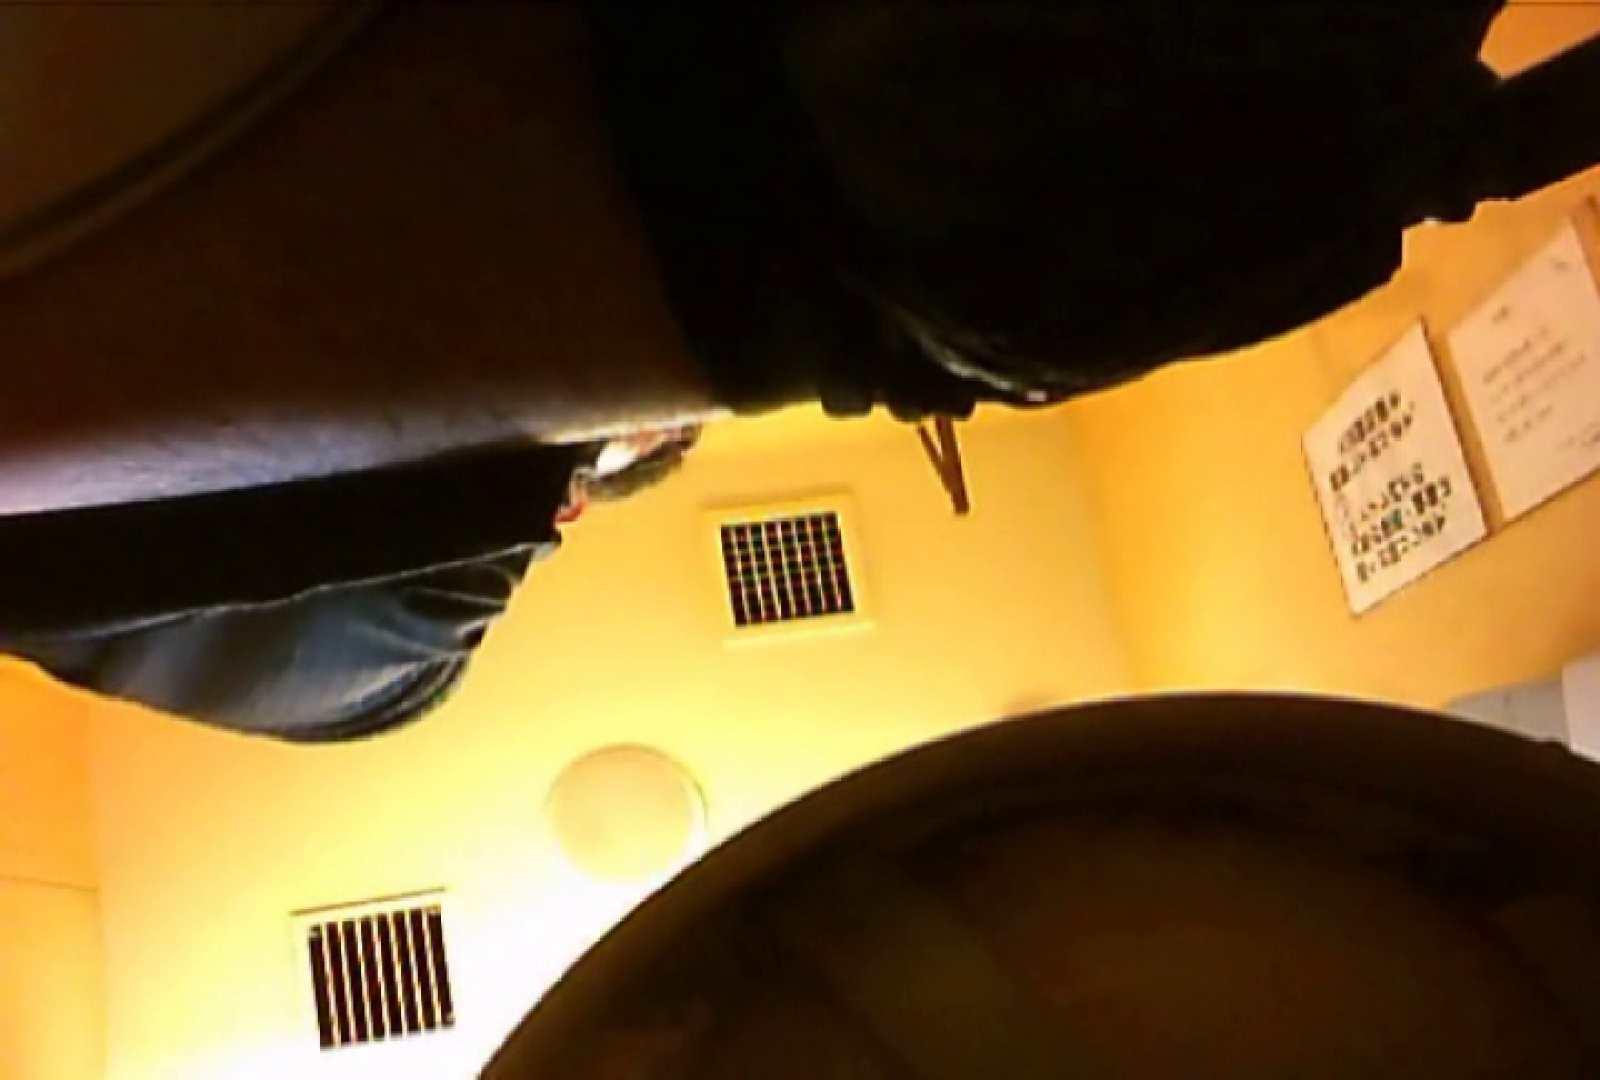 SEASON 2ND!掴み取りさんの洗面所覗き!in新幹線!VOL.02 スーツボーイズ | ノンケボーイズ  82pic 8